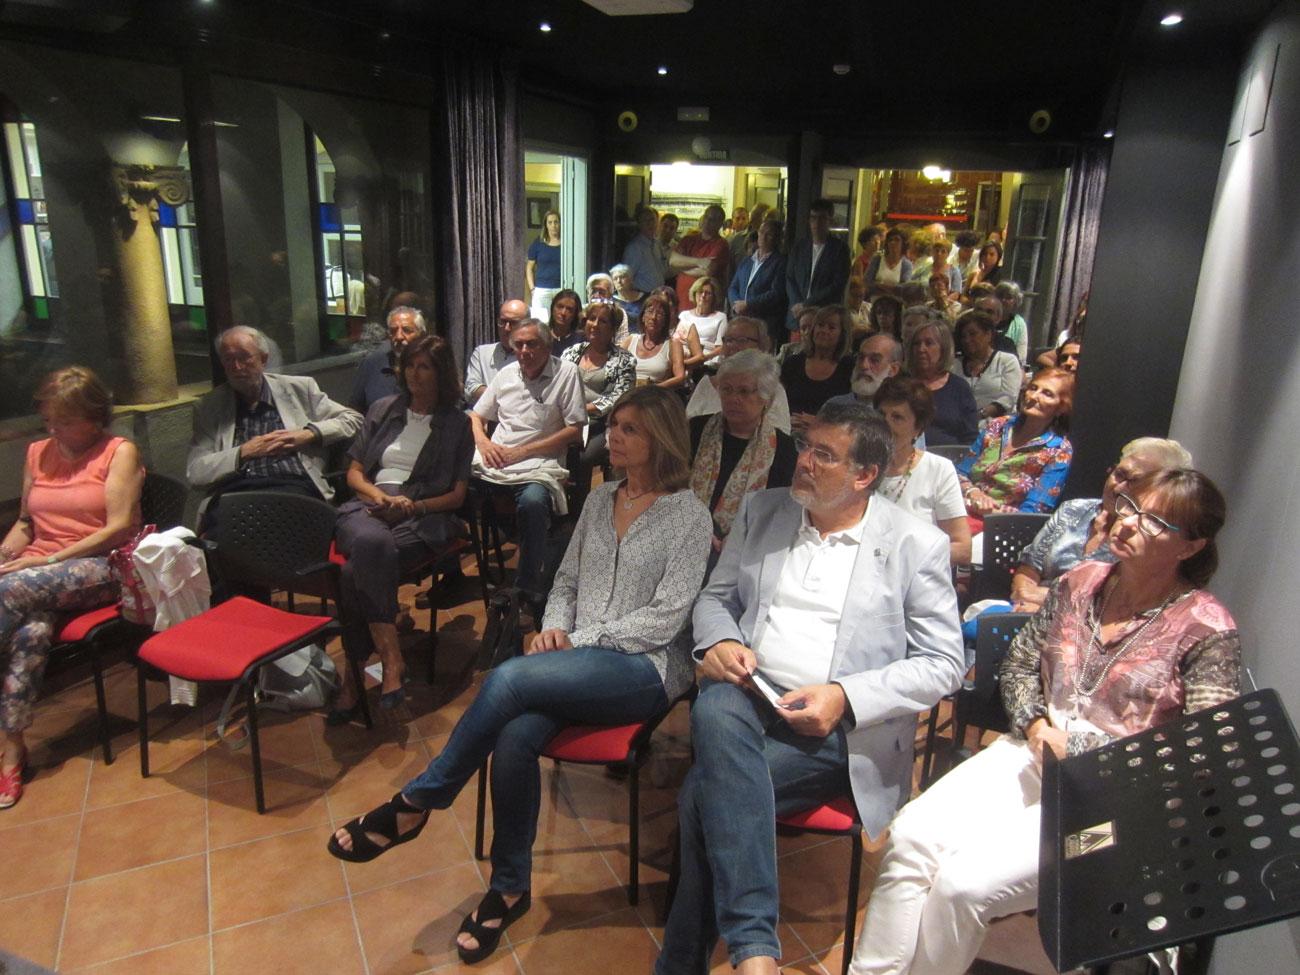 web-alfons-romero-casa-museu-cal-gerrer-fundacio-cabanas-78437